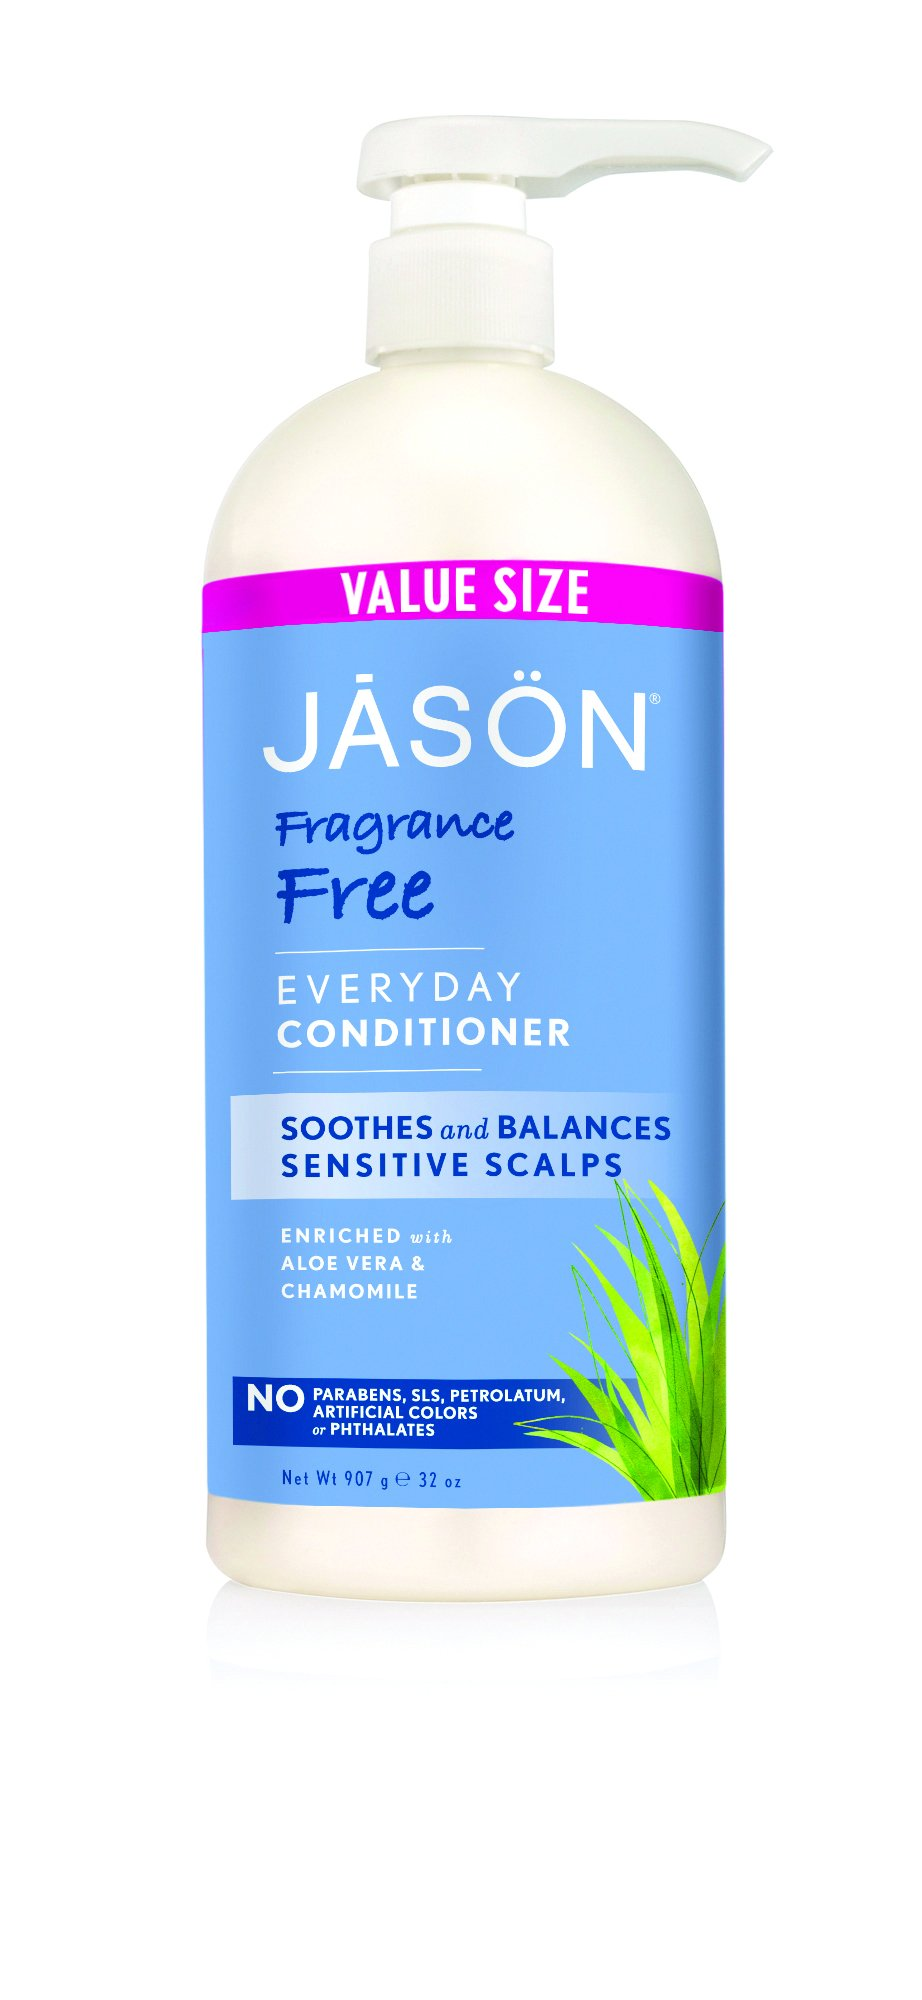 Jason Fragrance Free Conditioner, 32 Fluid Ounce